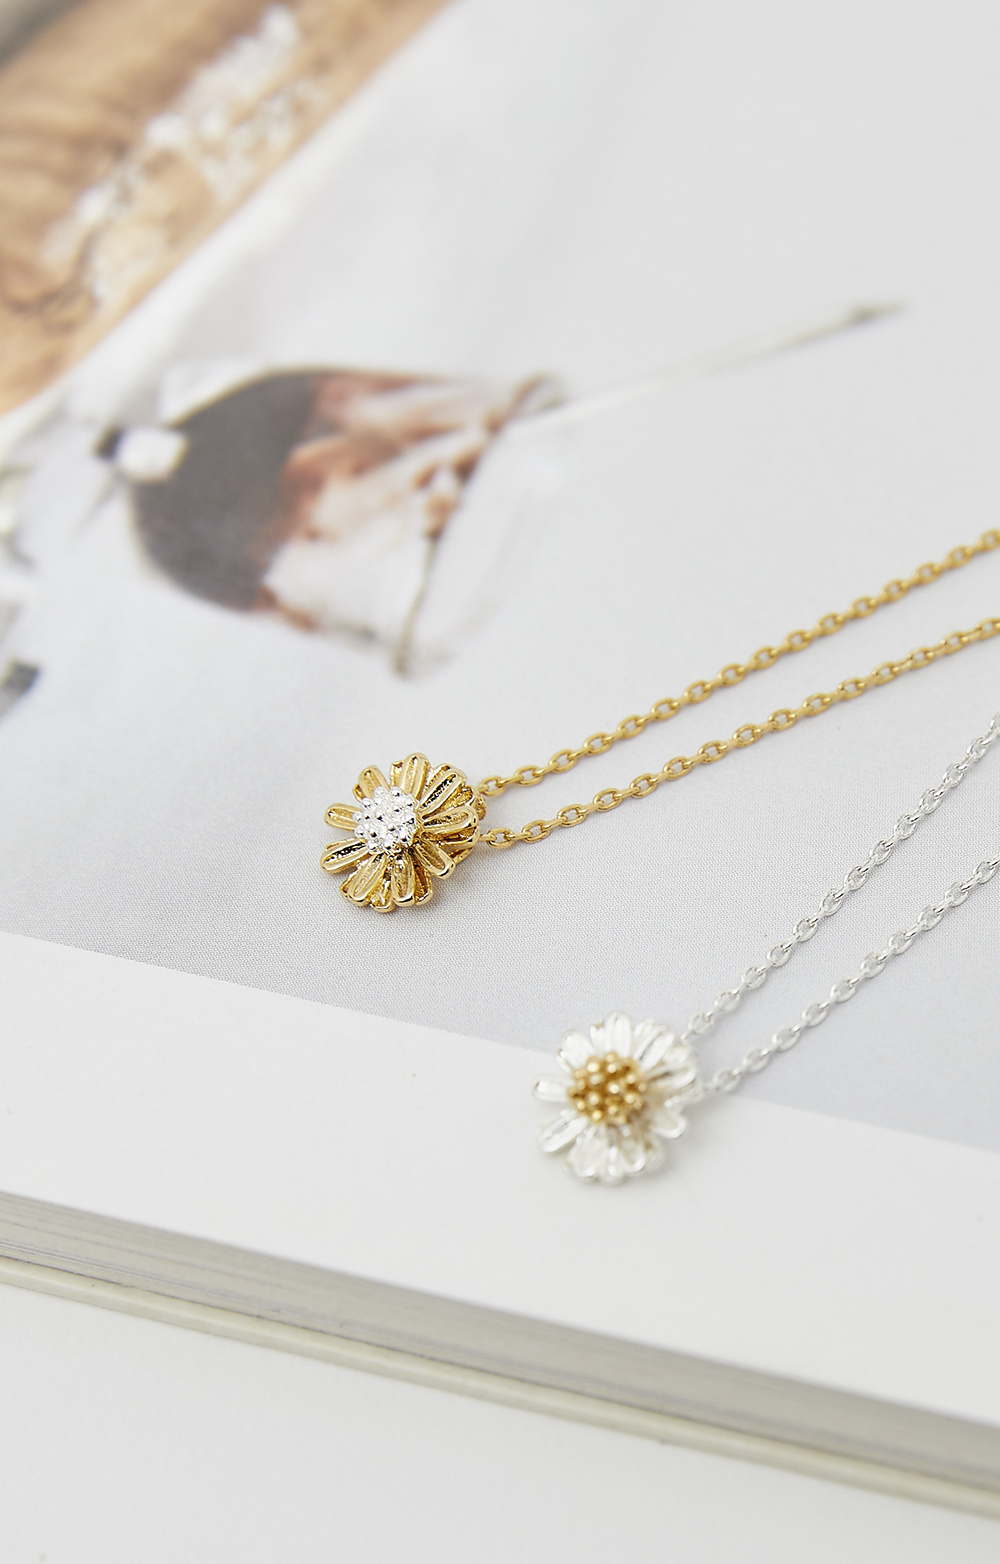 Small dandelion necklace